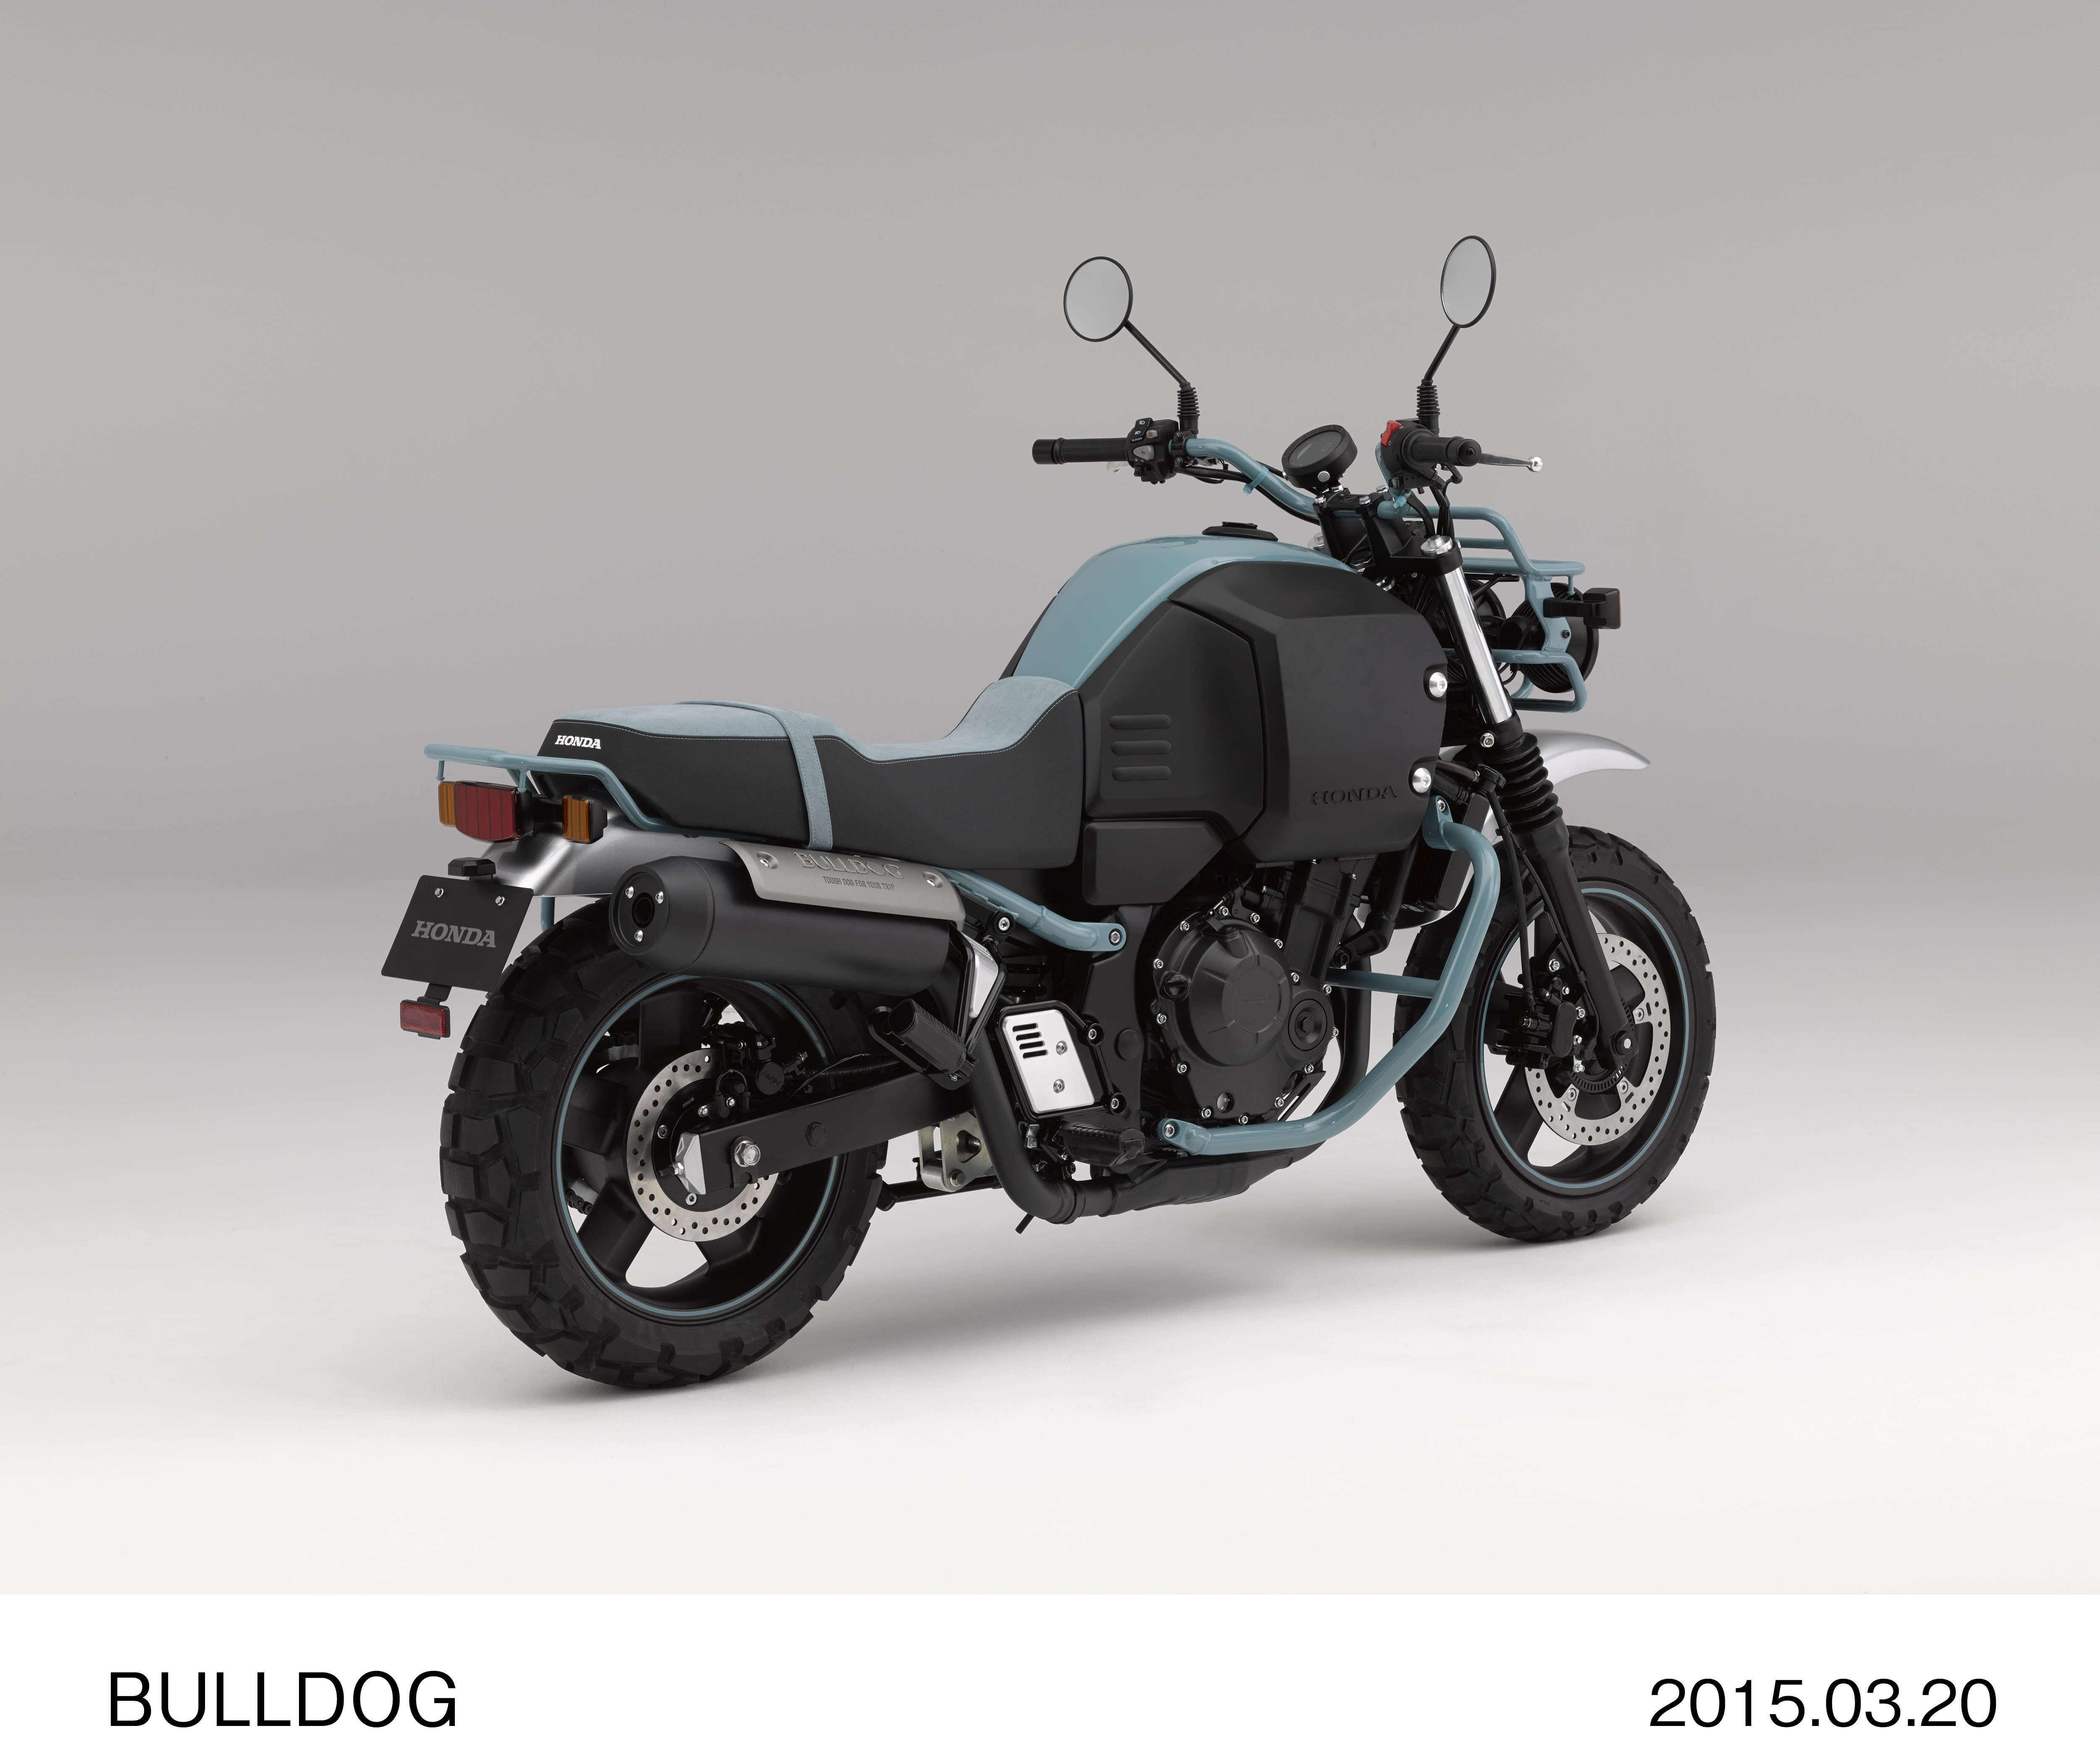 Honda Bulldog revealed